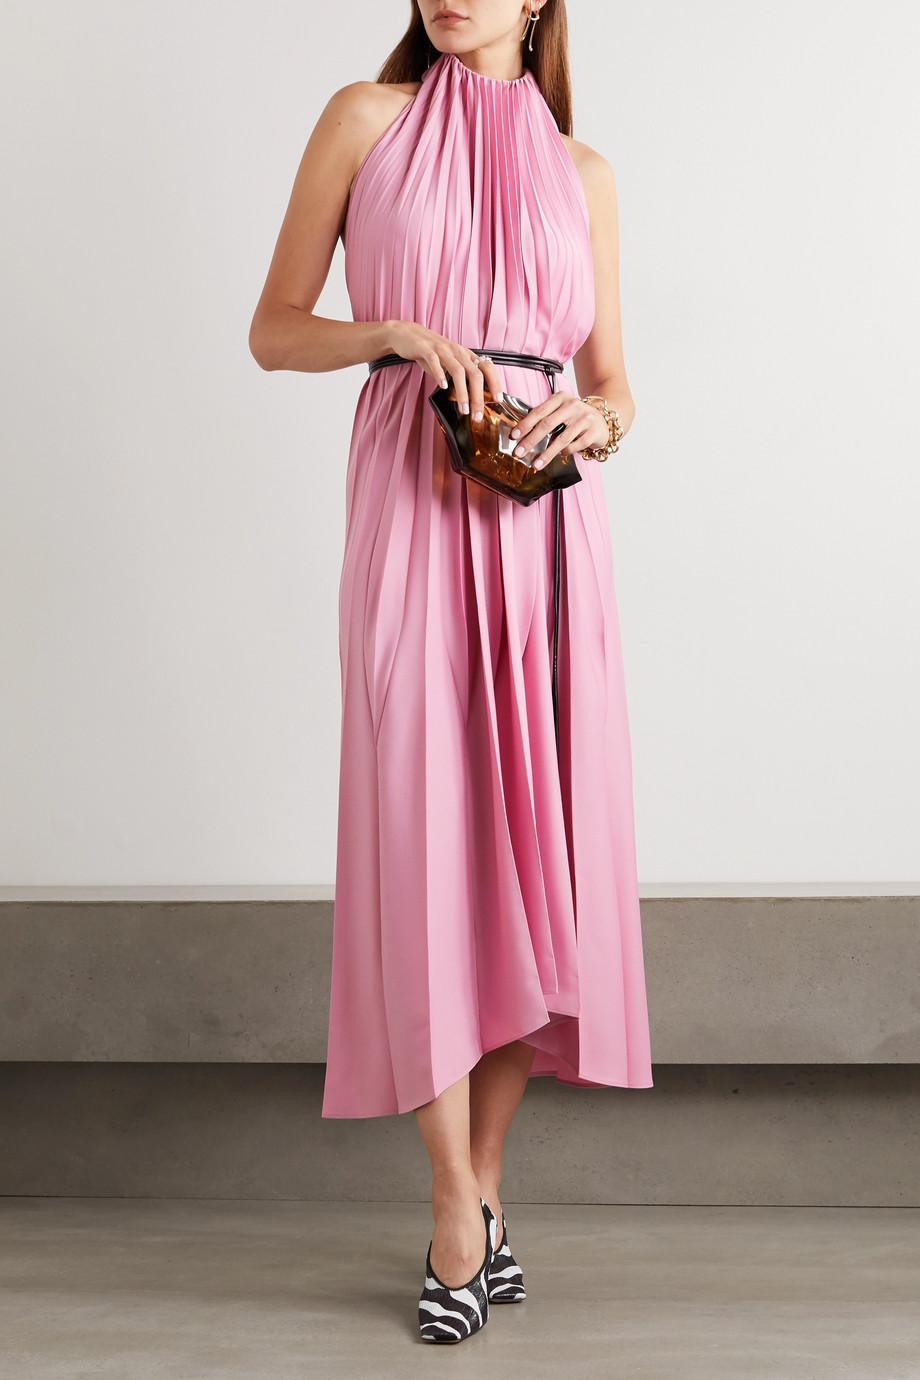 Ellery The Great belted pleated crepe halterneck midi dress